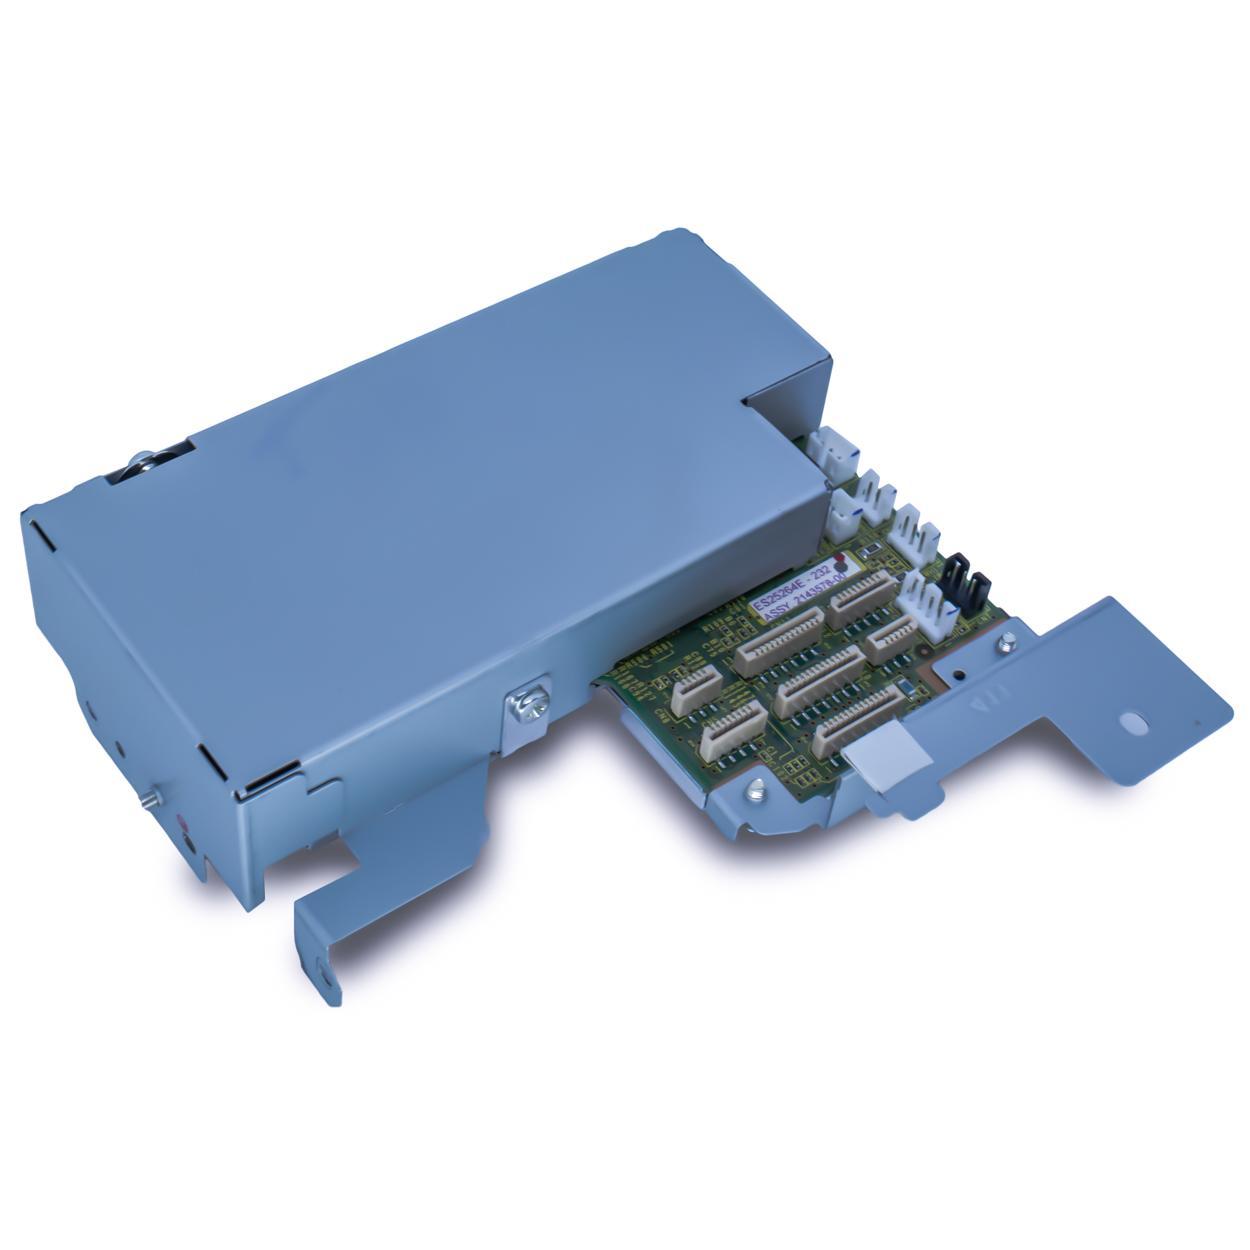 Placa Lógica da Impressora Epson T50 - PartNumber: 2143578